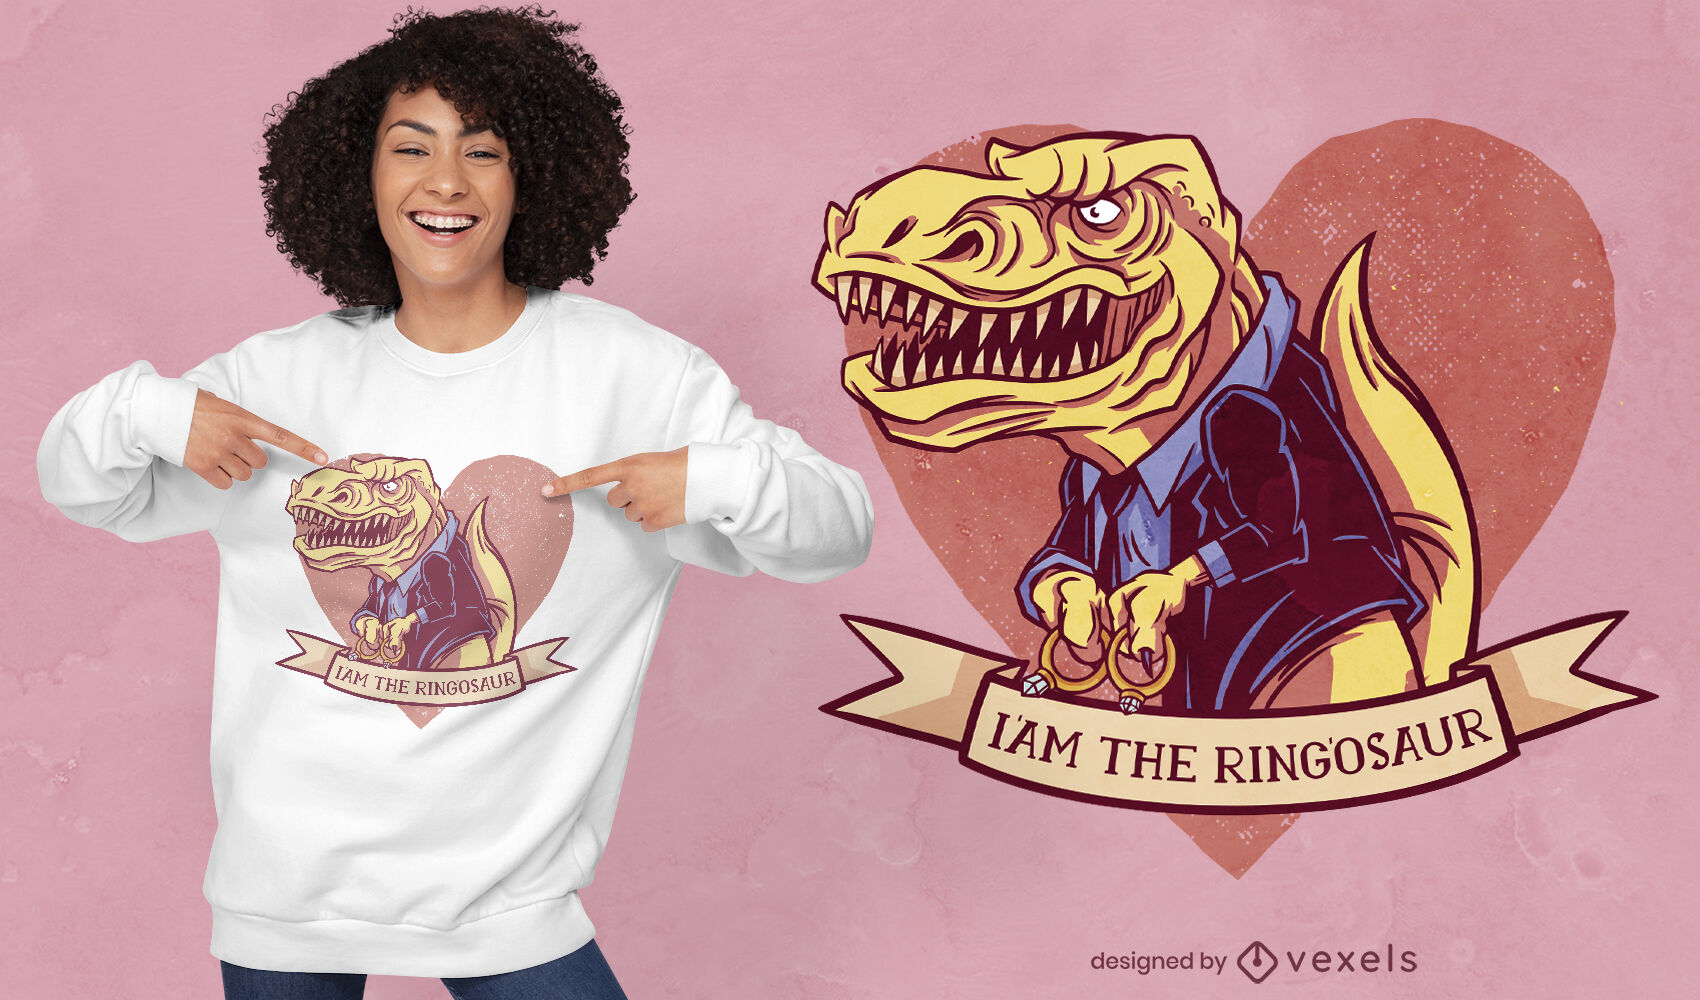 Ringosaur t-rex t-shirt design